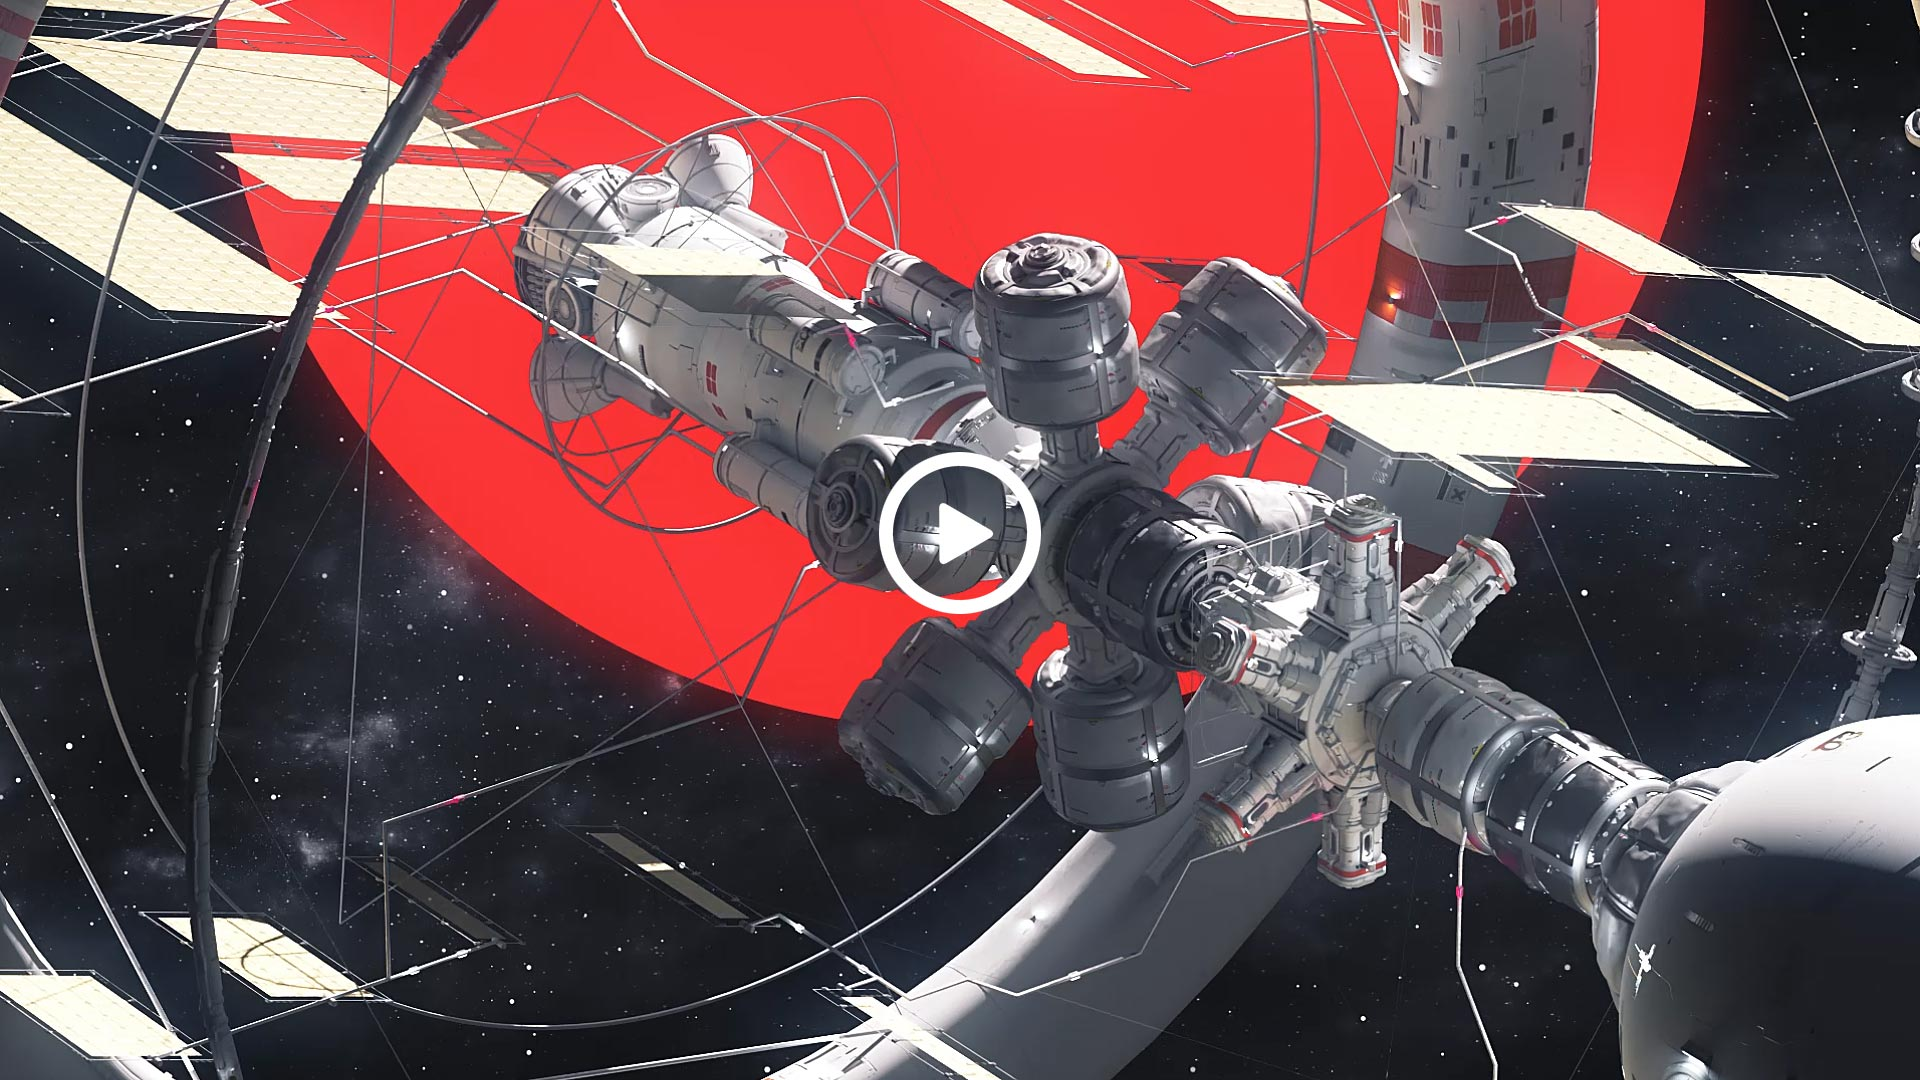 Florian Renner // Design, Animation, 3D Visualization